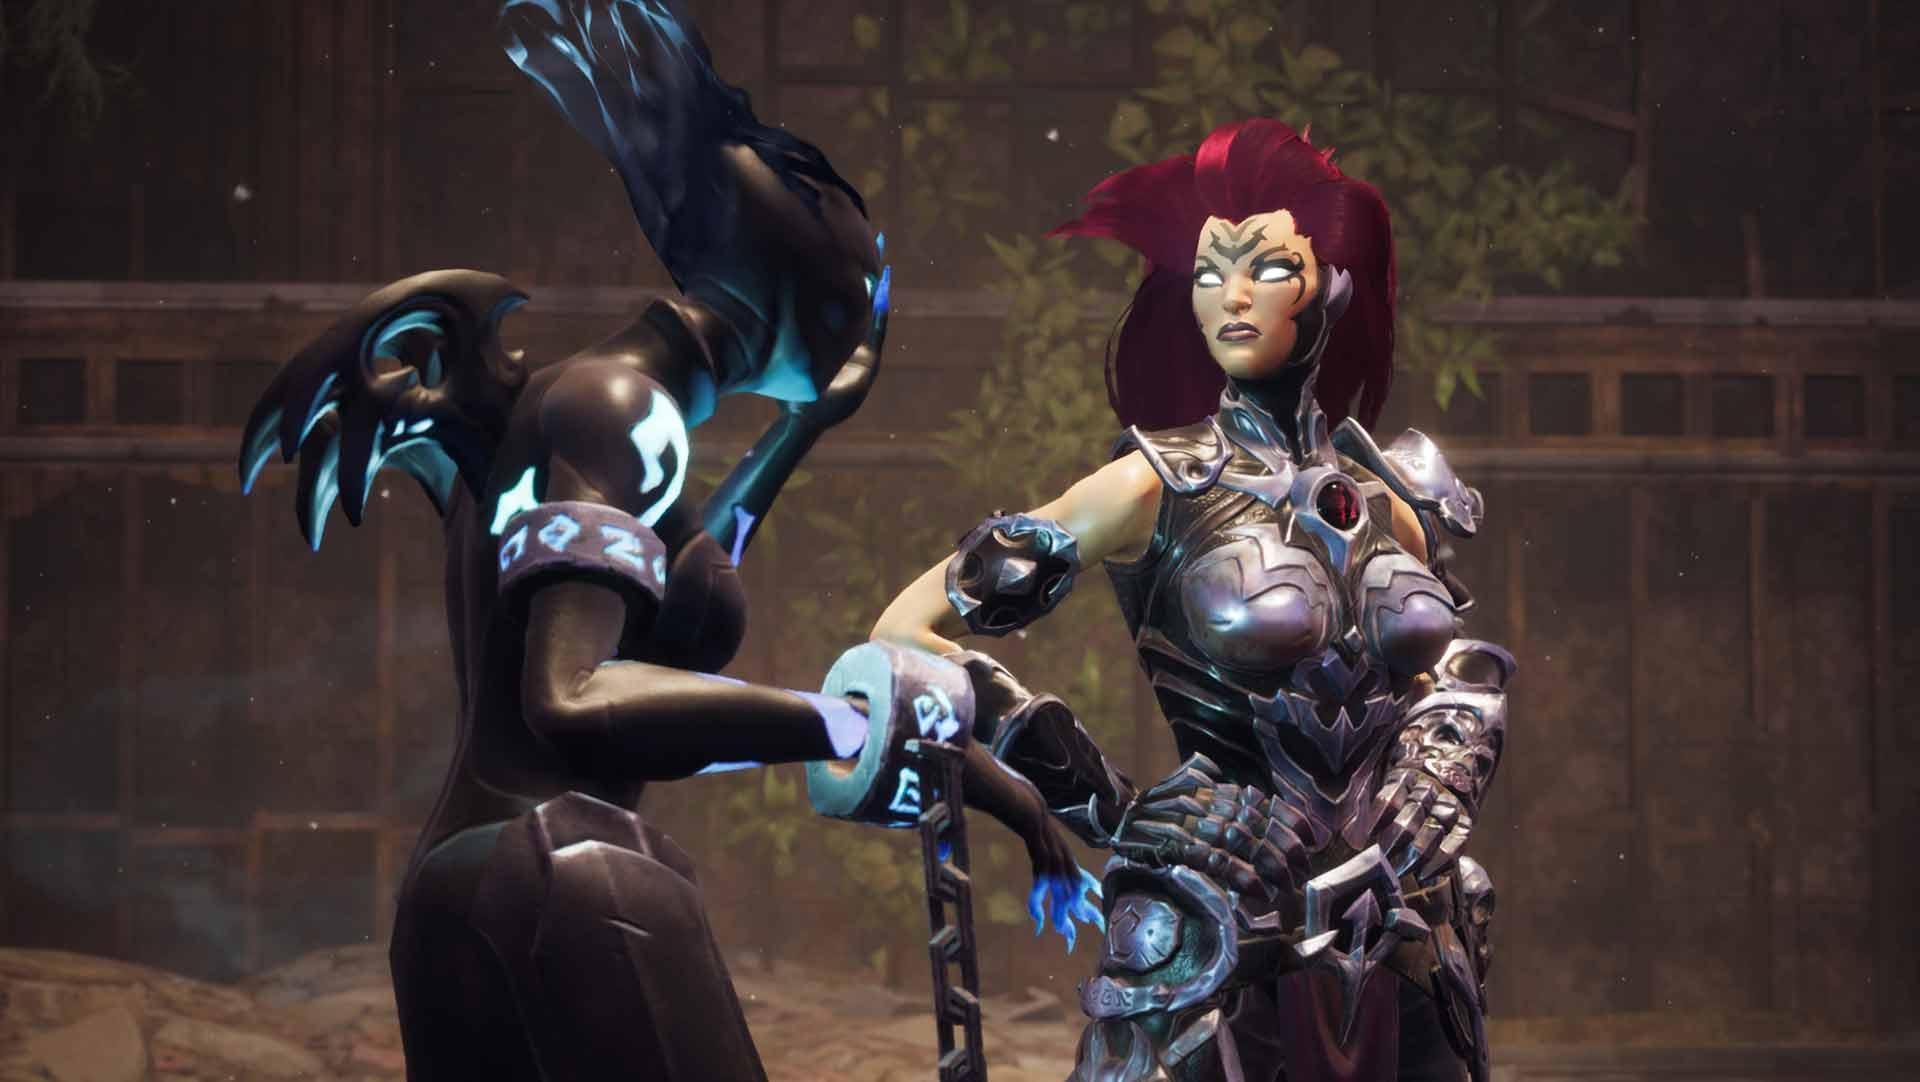 Darksiders III game image